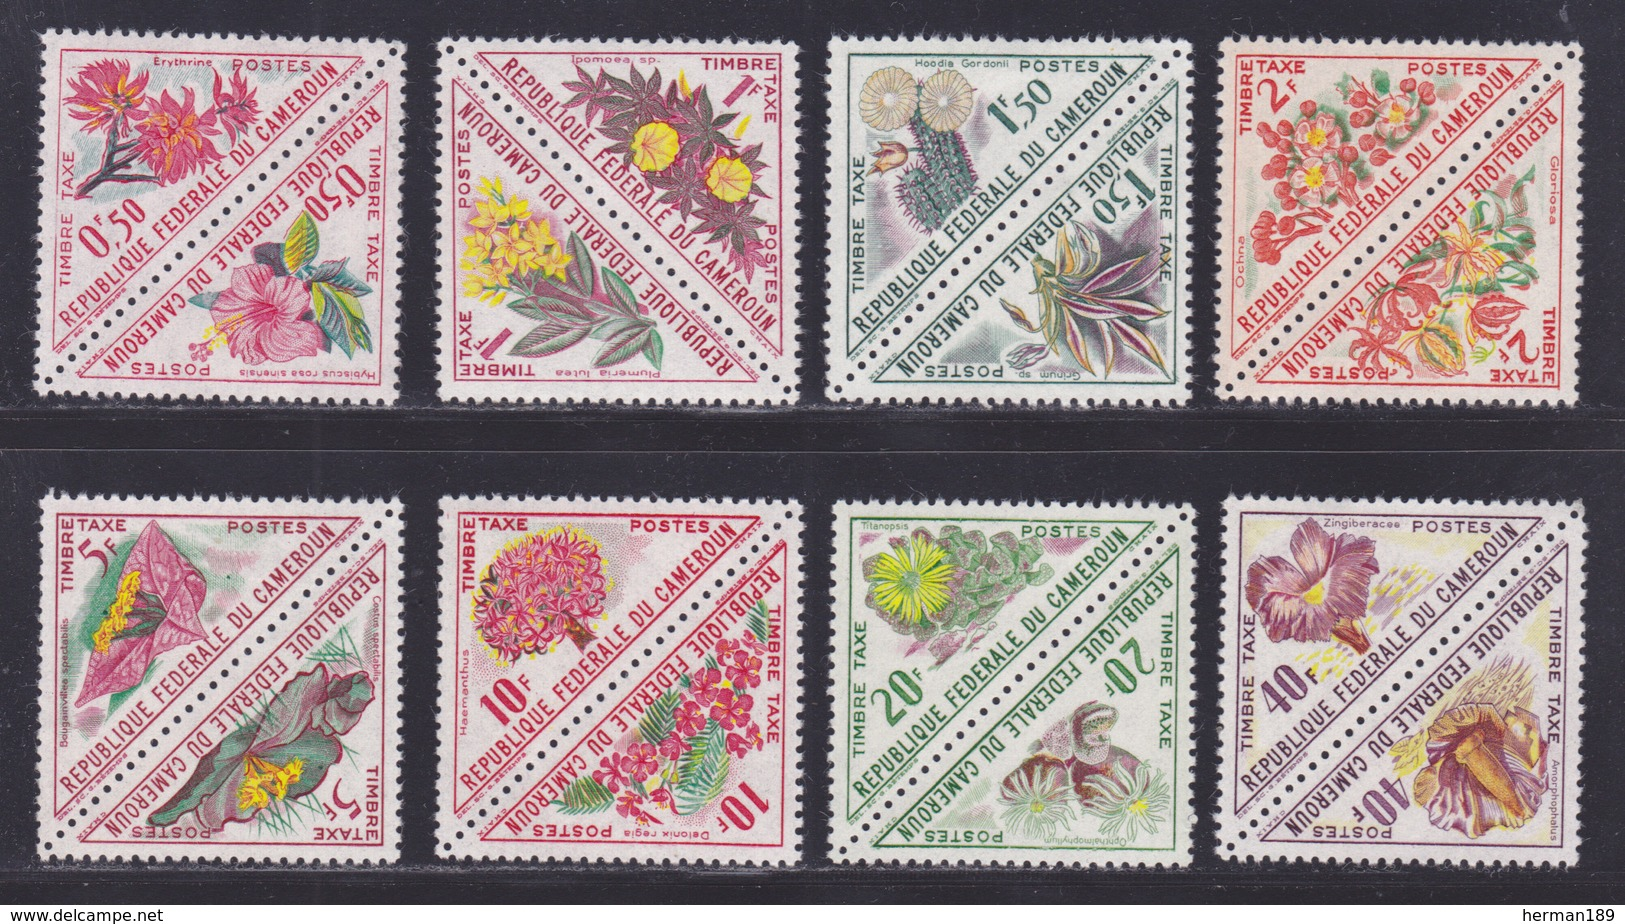 CAMEROUN TAXE N°   35 à 50, AERIENS N° 58 ** MNH Neufs Sans Charnière, TB (D7519) Flore, Fleurs Diverses 1963 - Kameroen (1960-...)